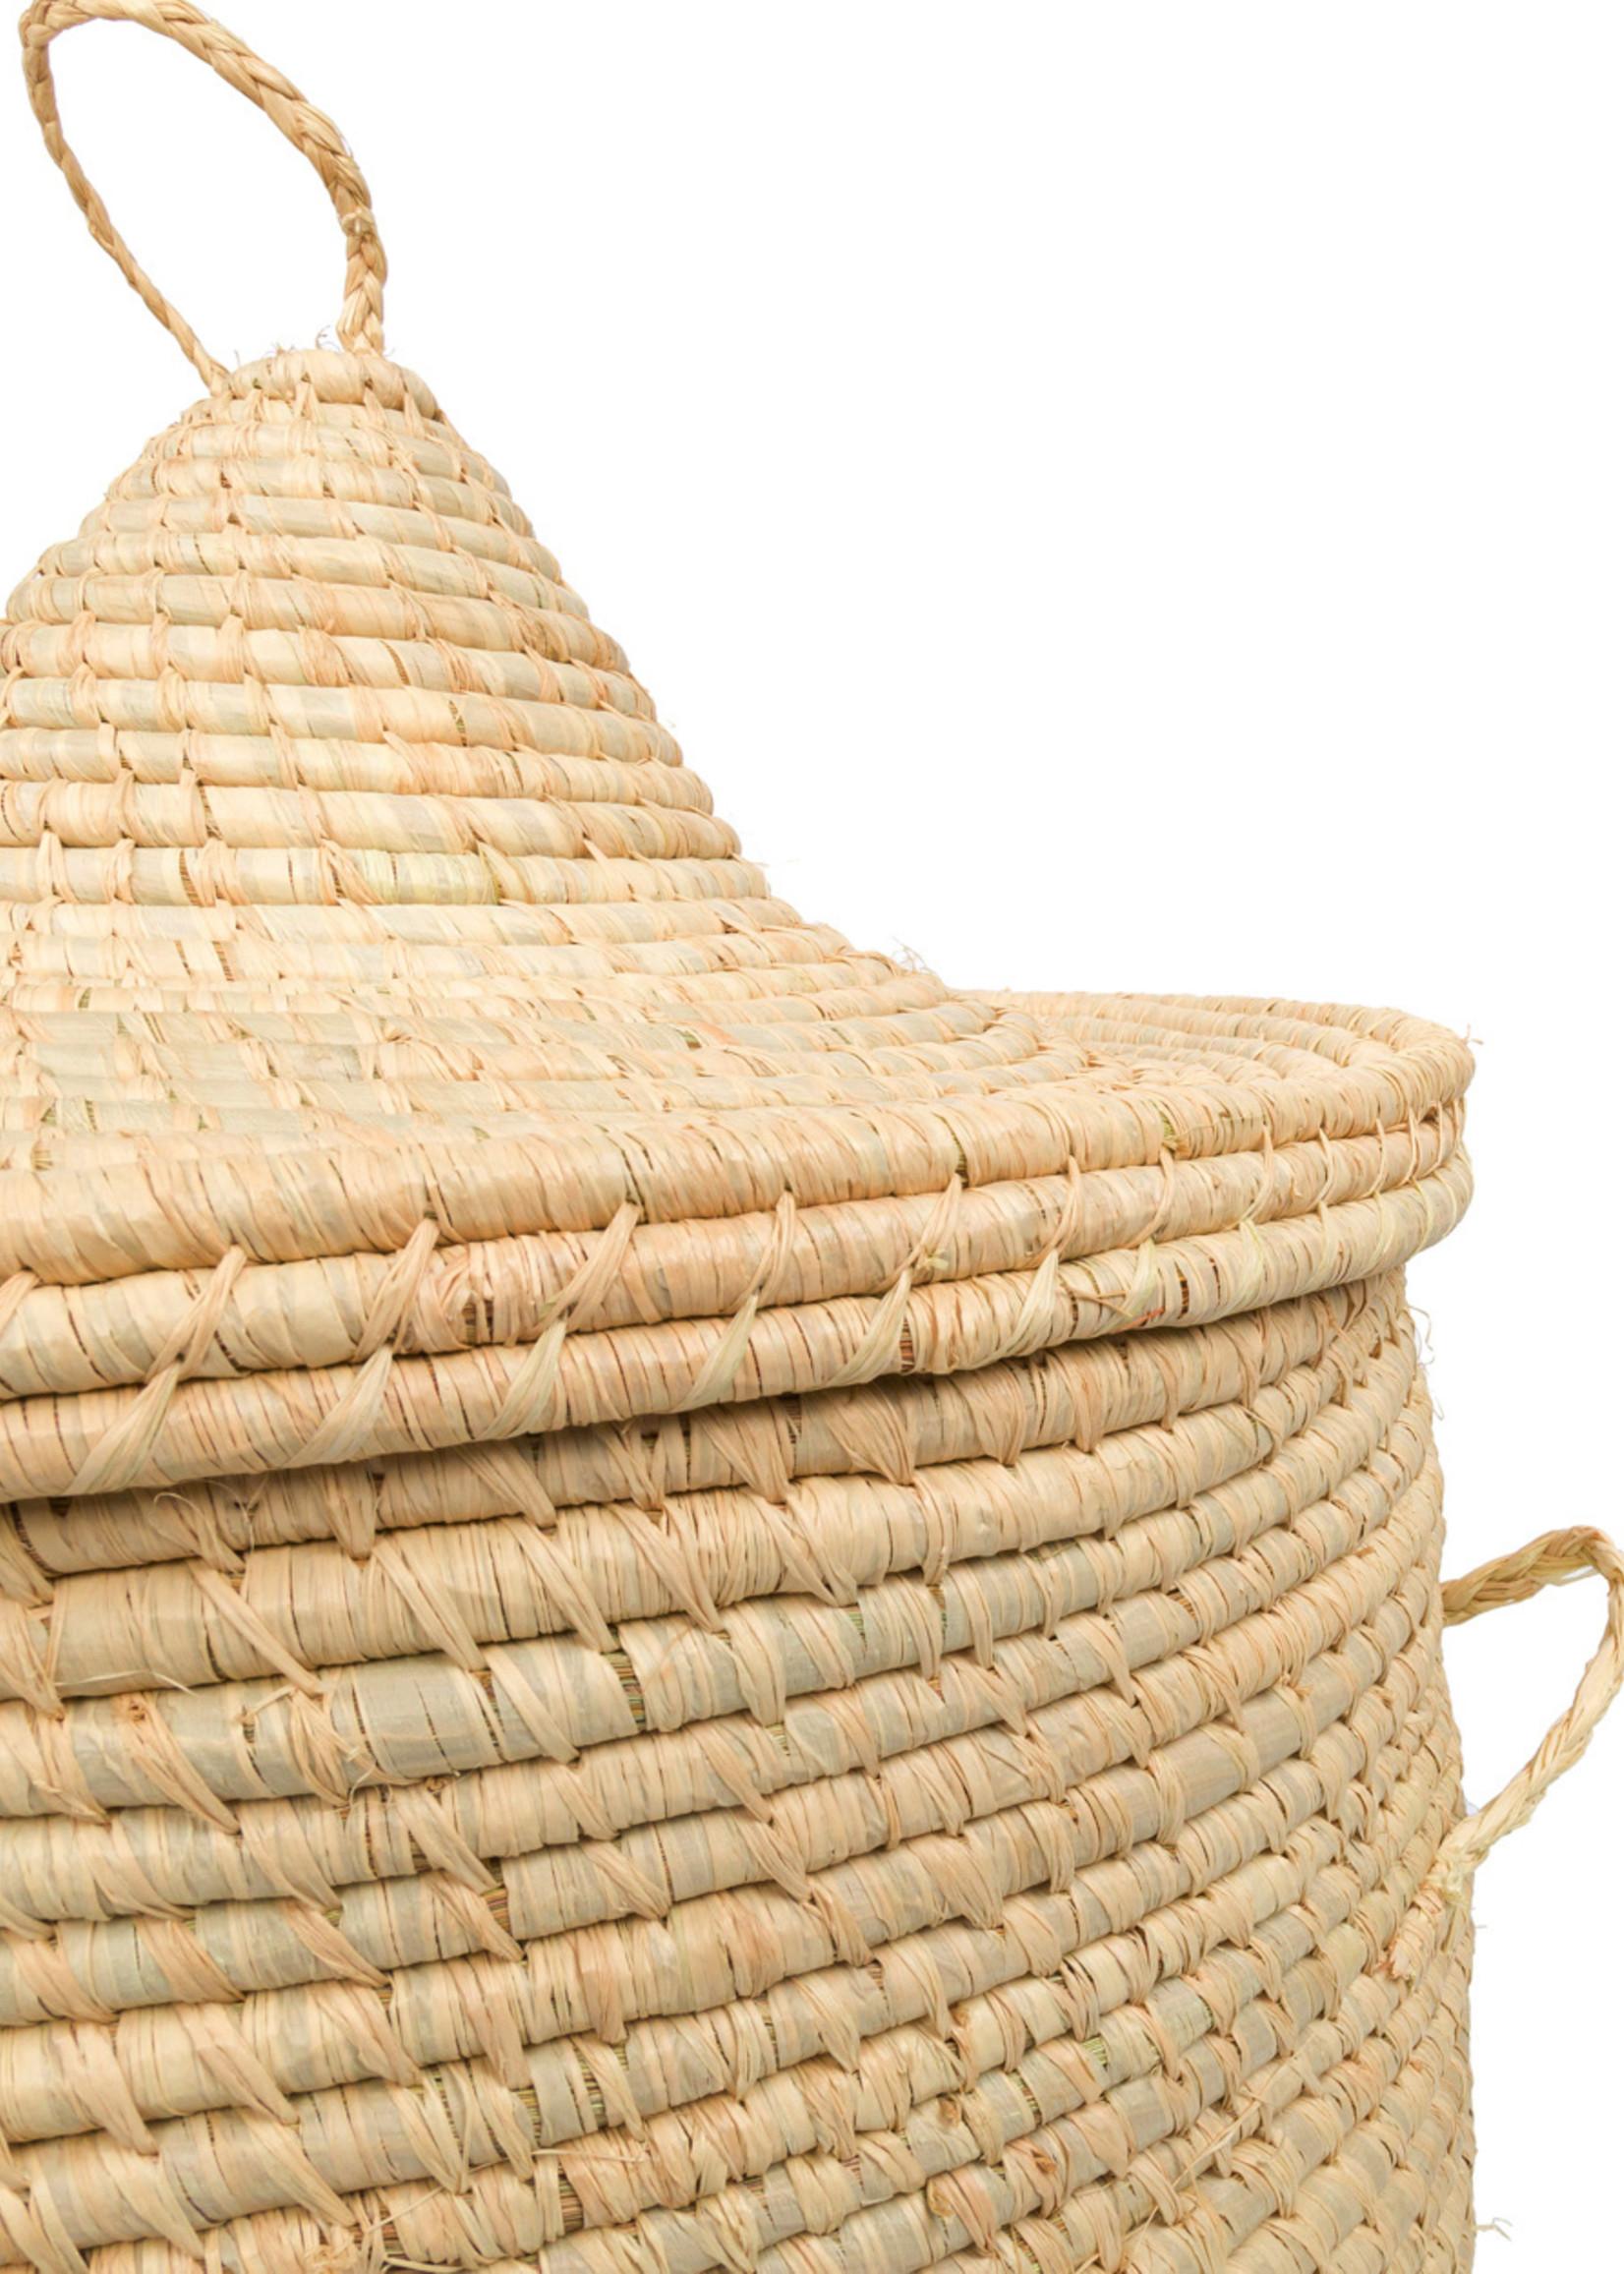 The Bozaka Laundry Basket  - Natural - M